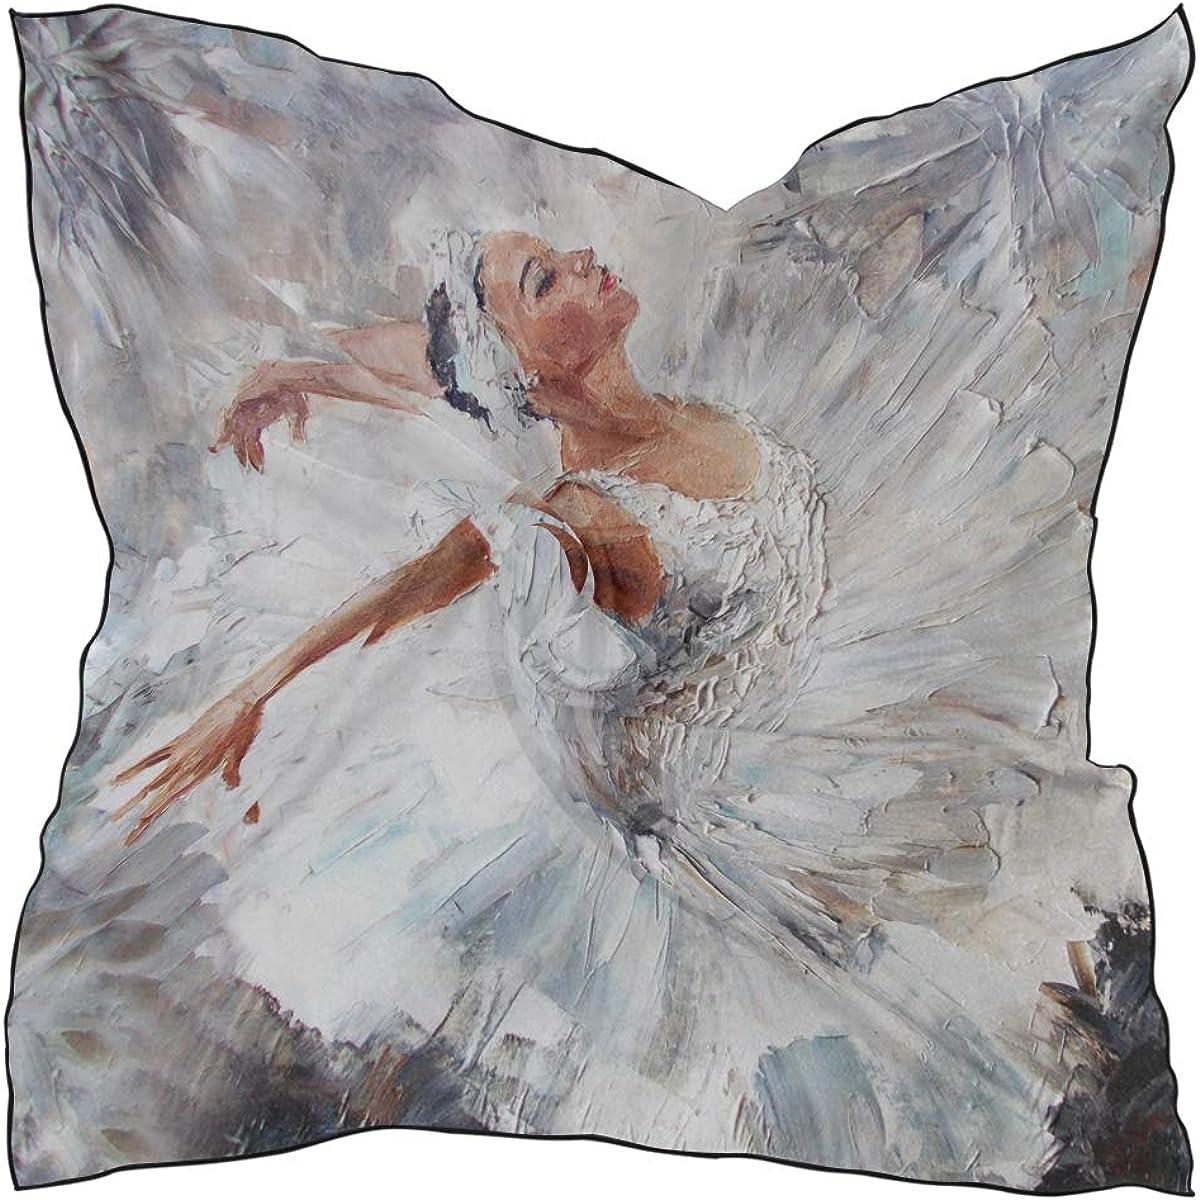 Women's Soft Polyester Silk Square Scarf Ballerina Female Oil Painting Art Dance Elegant Dance Fashion Print Head & Hair Scarf Neckerchief Accessory-23.6x23.6 Inch